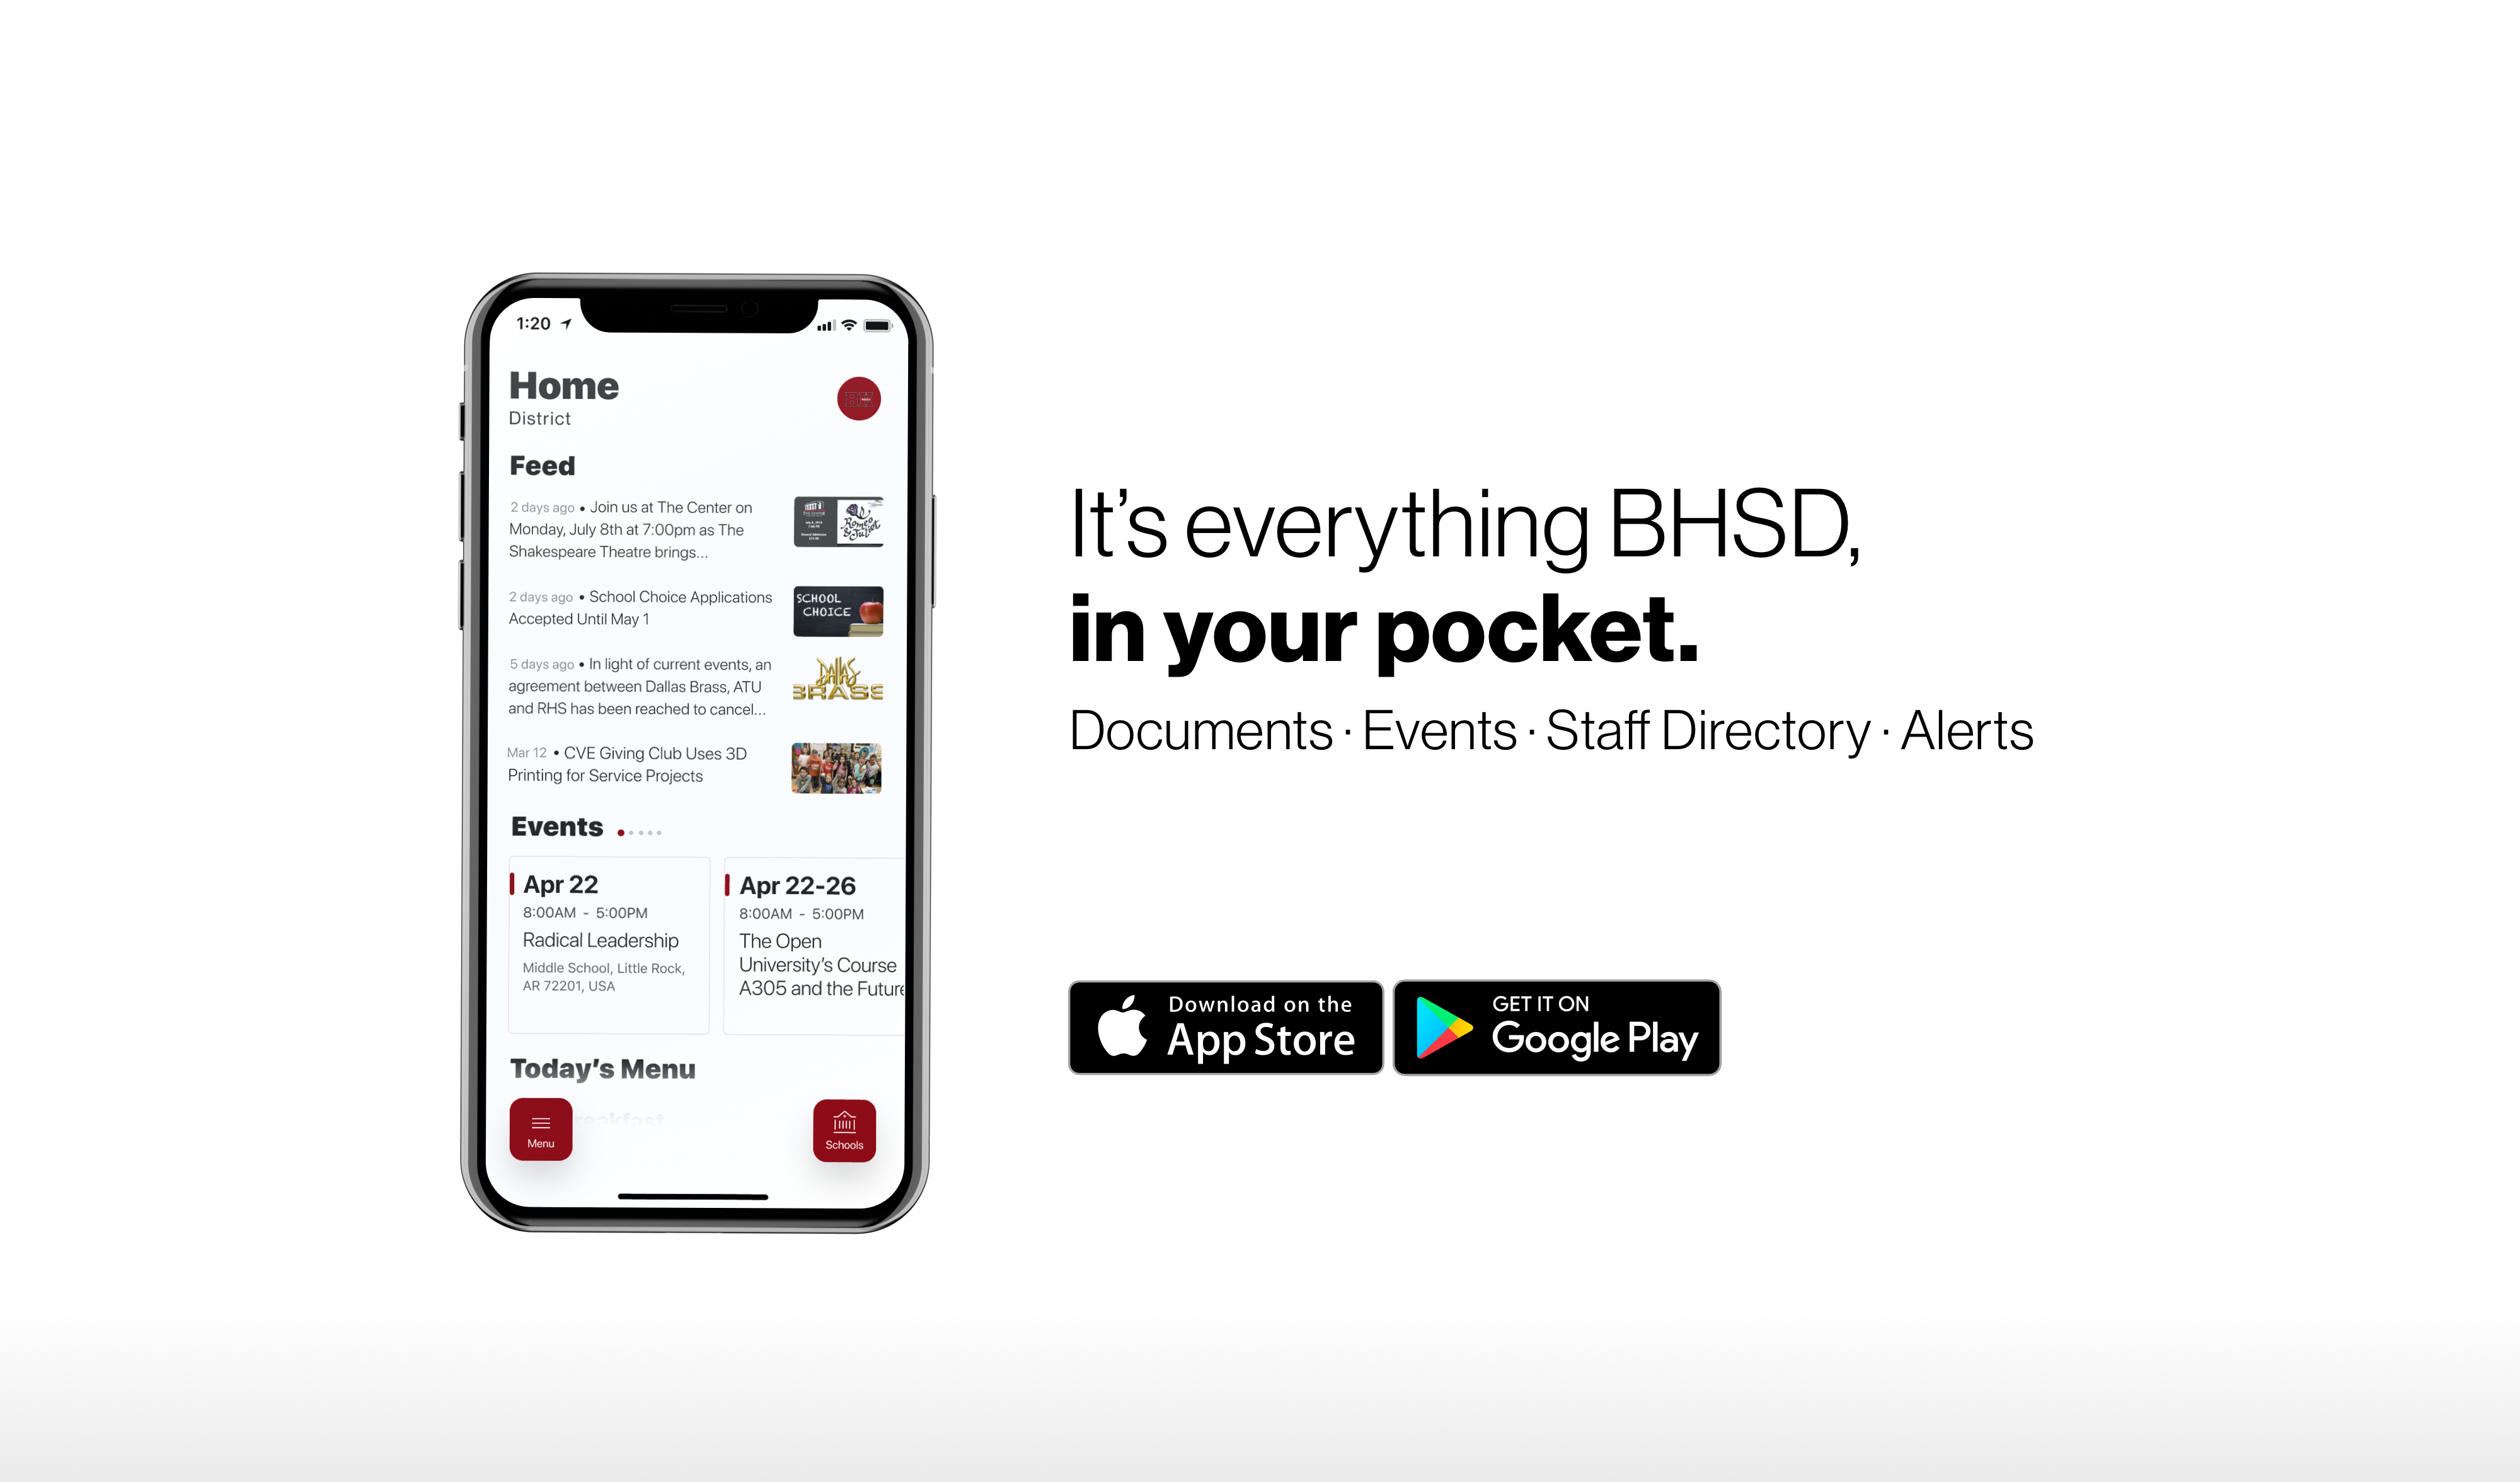 Download the Britton-Hecla mobile app!